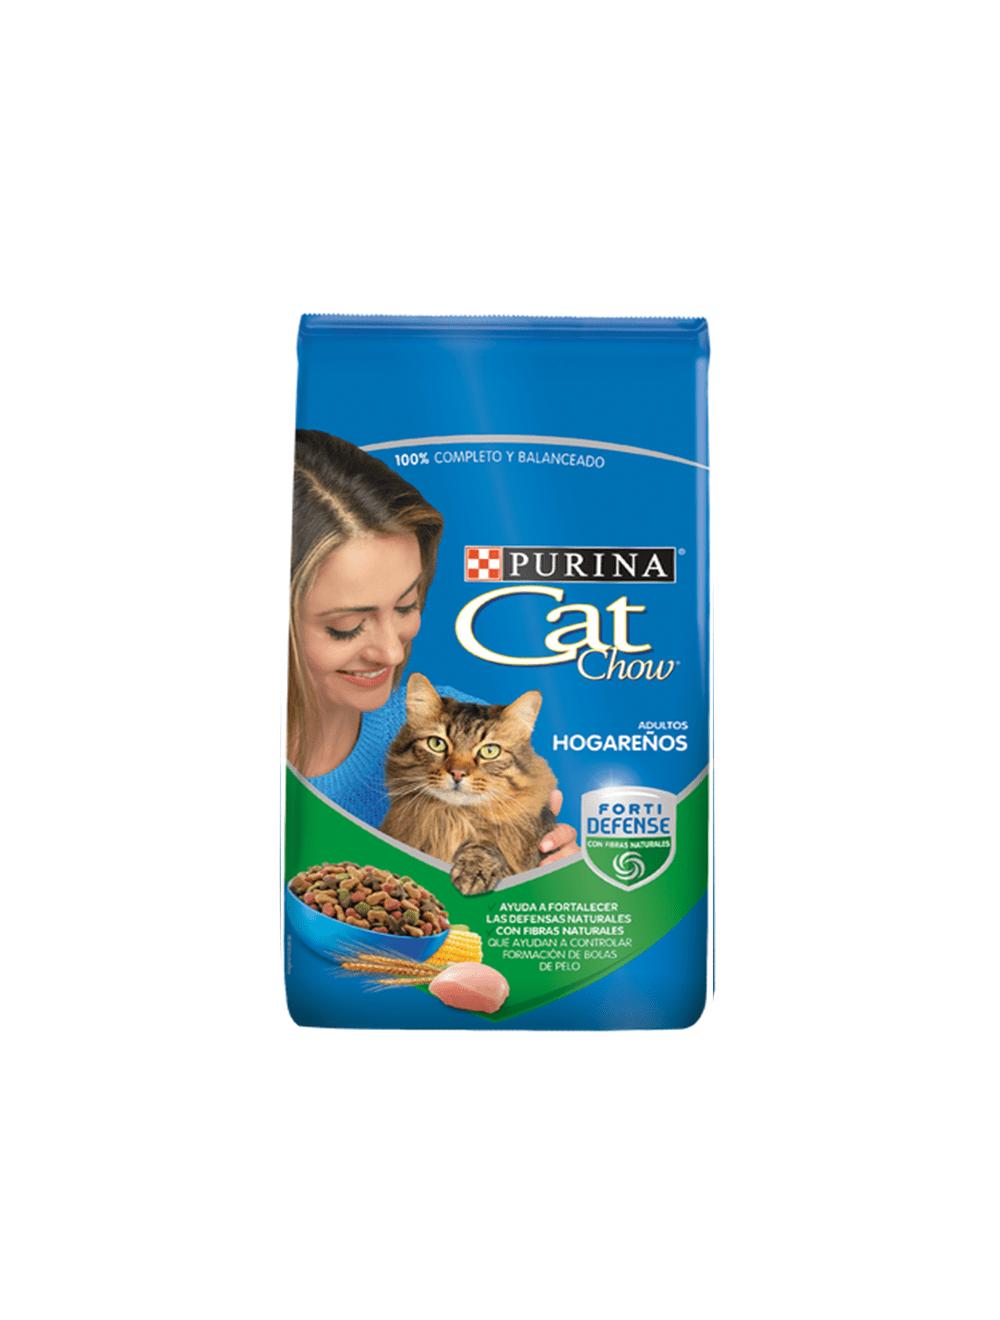 Cat Chow Hogareños 0,500 Kg